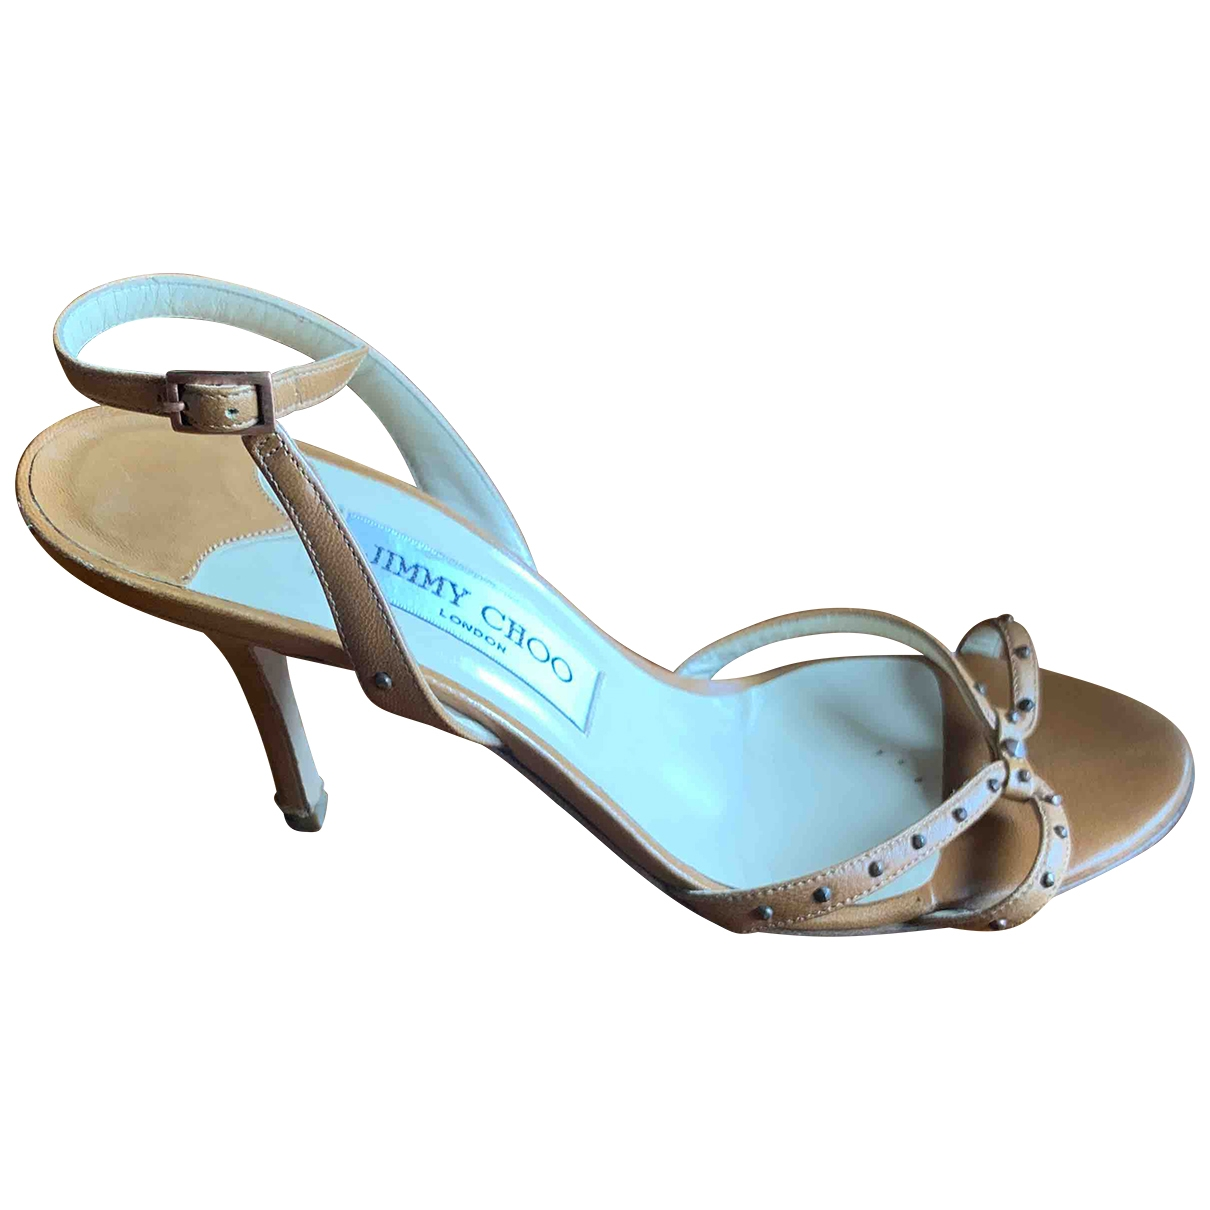 Jimmy Choo \N Camel Leather Sandals for Women 37.5 EU